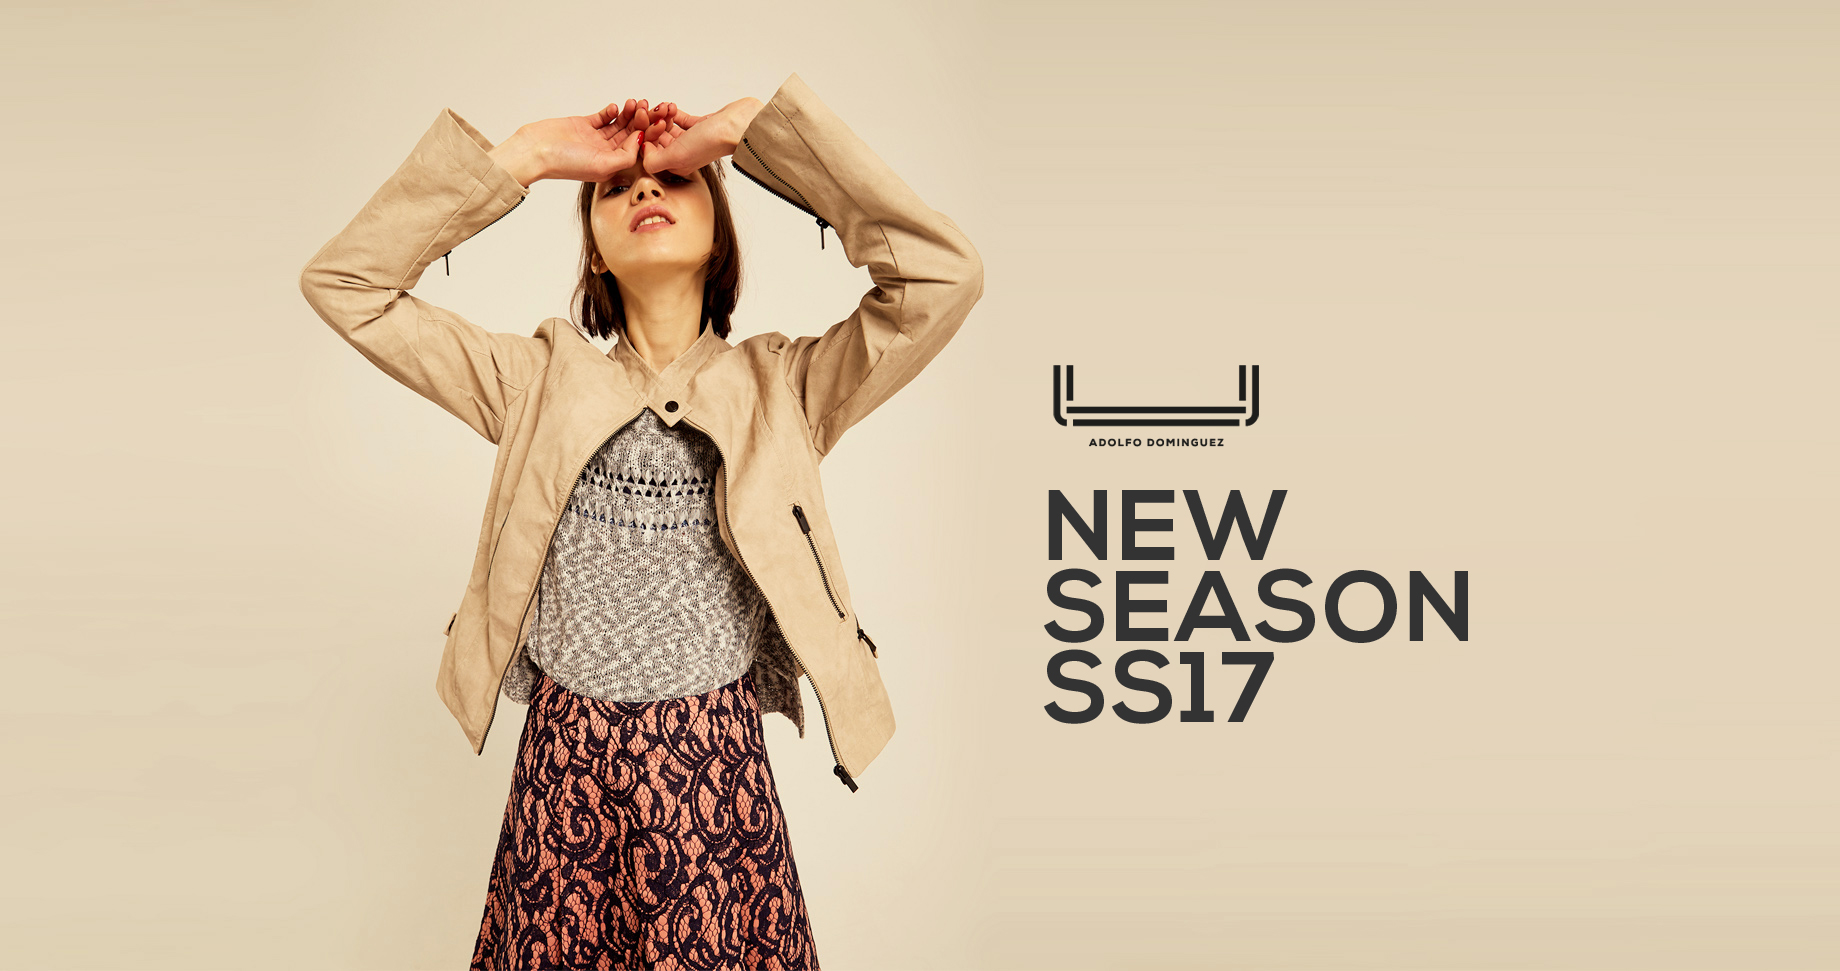 New season u-woman